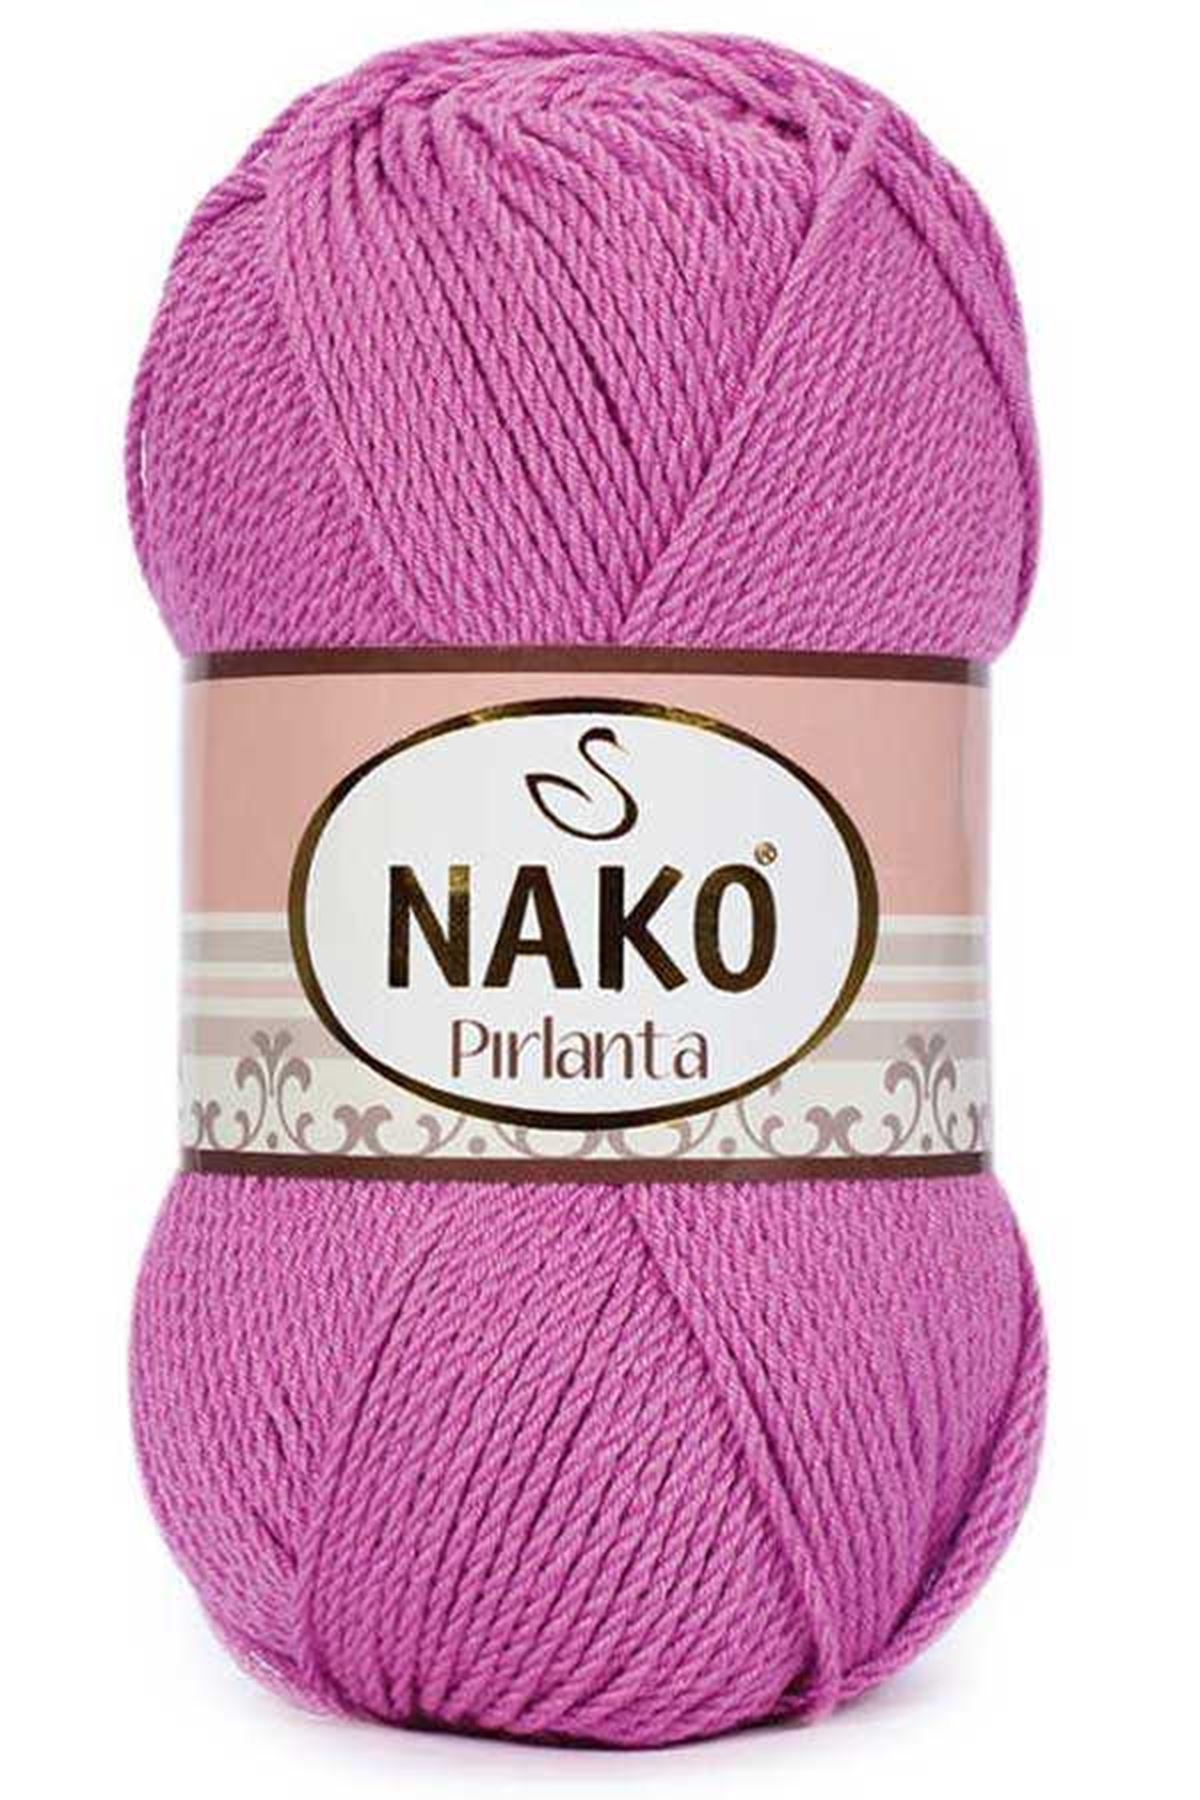 Nako Pırlanta-1249 Gül